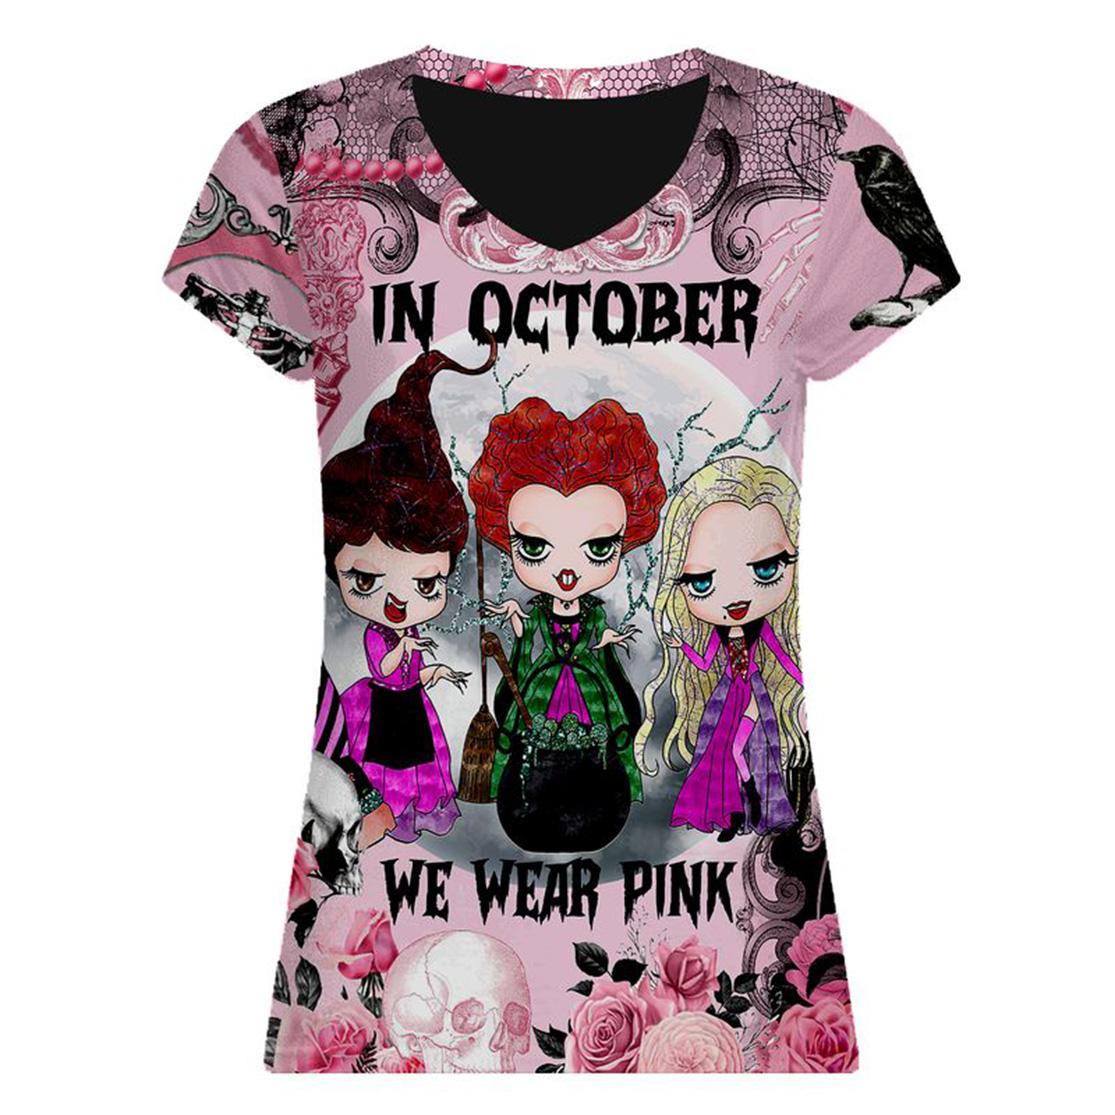 Breast cancer awareness happy halloween Sanderson Sisters In october we wear pink 3d v-neck